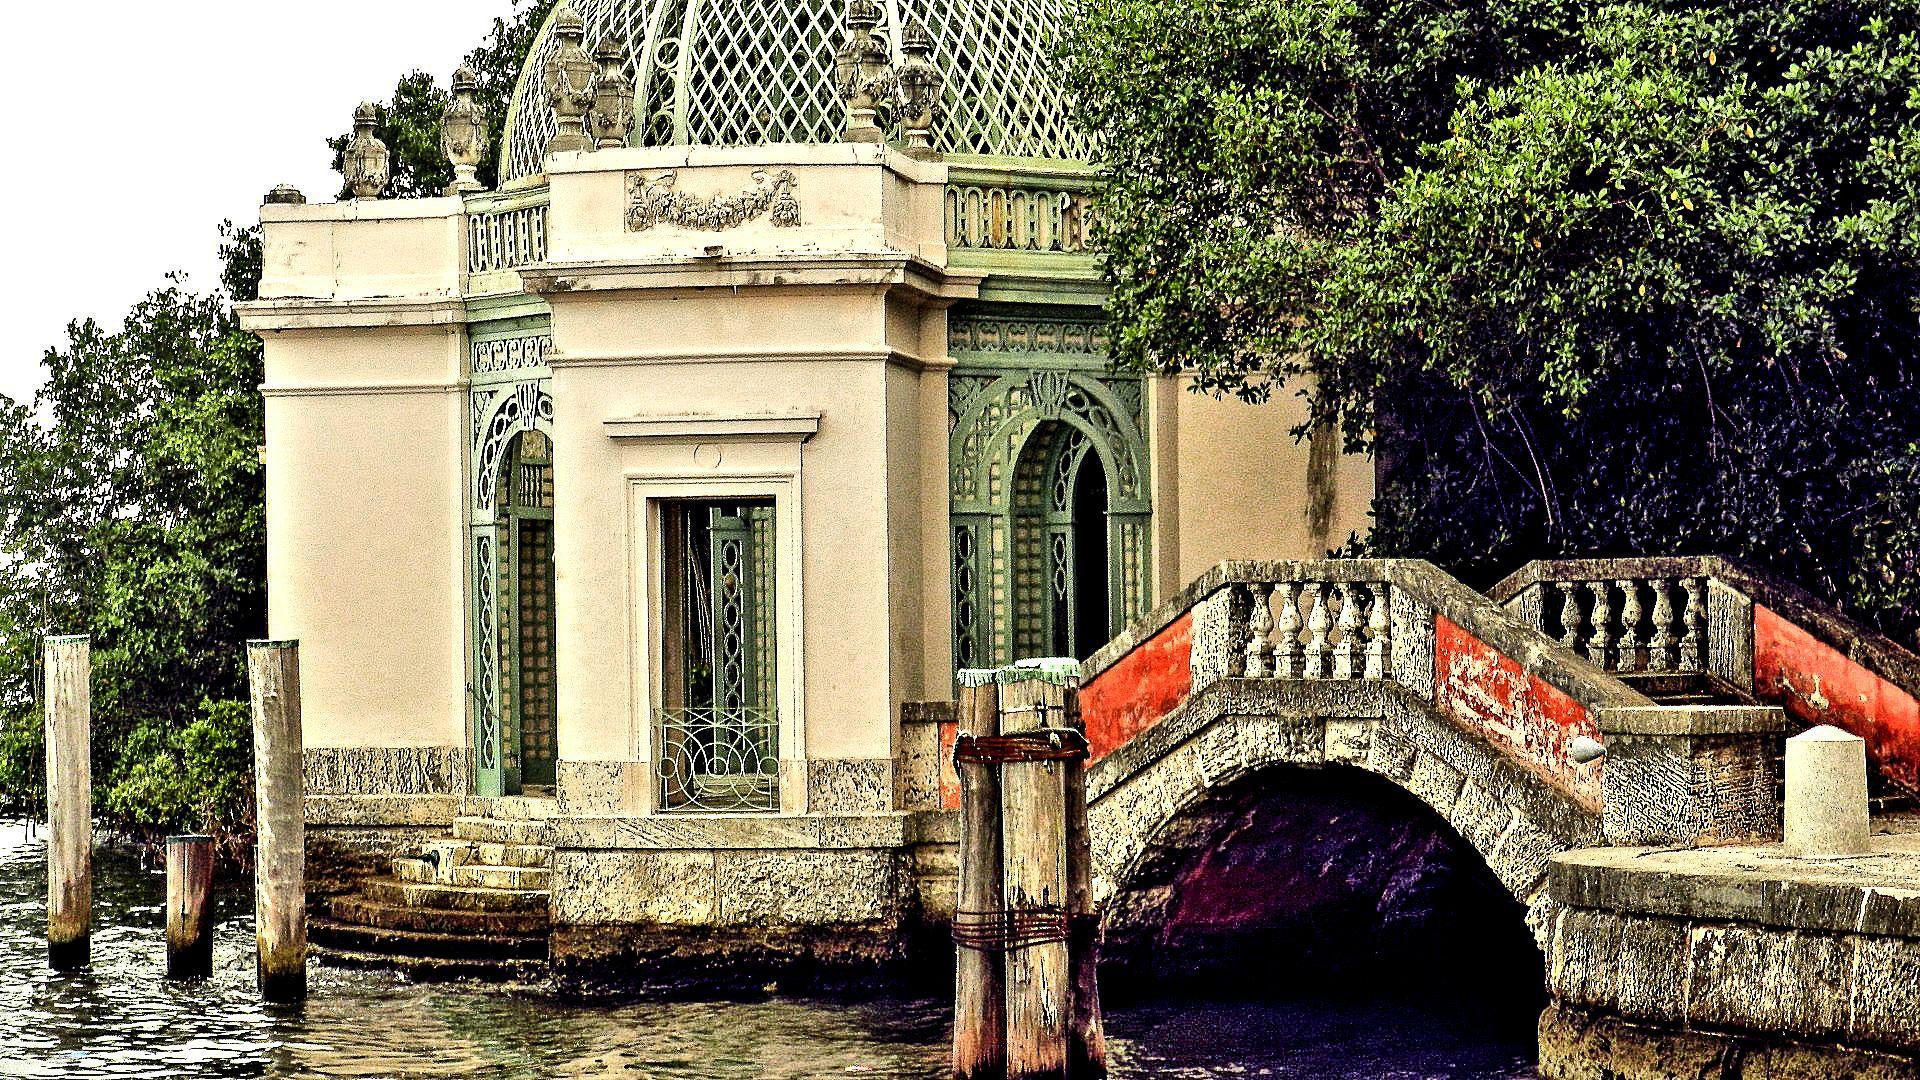 Vizcaya - Miami by Rhiannon44